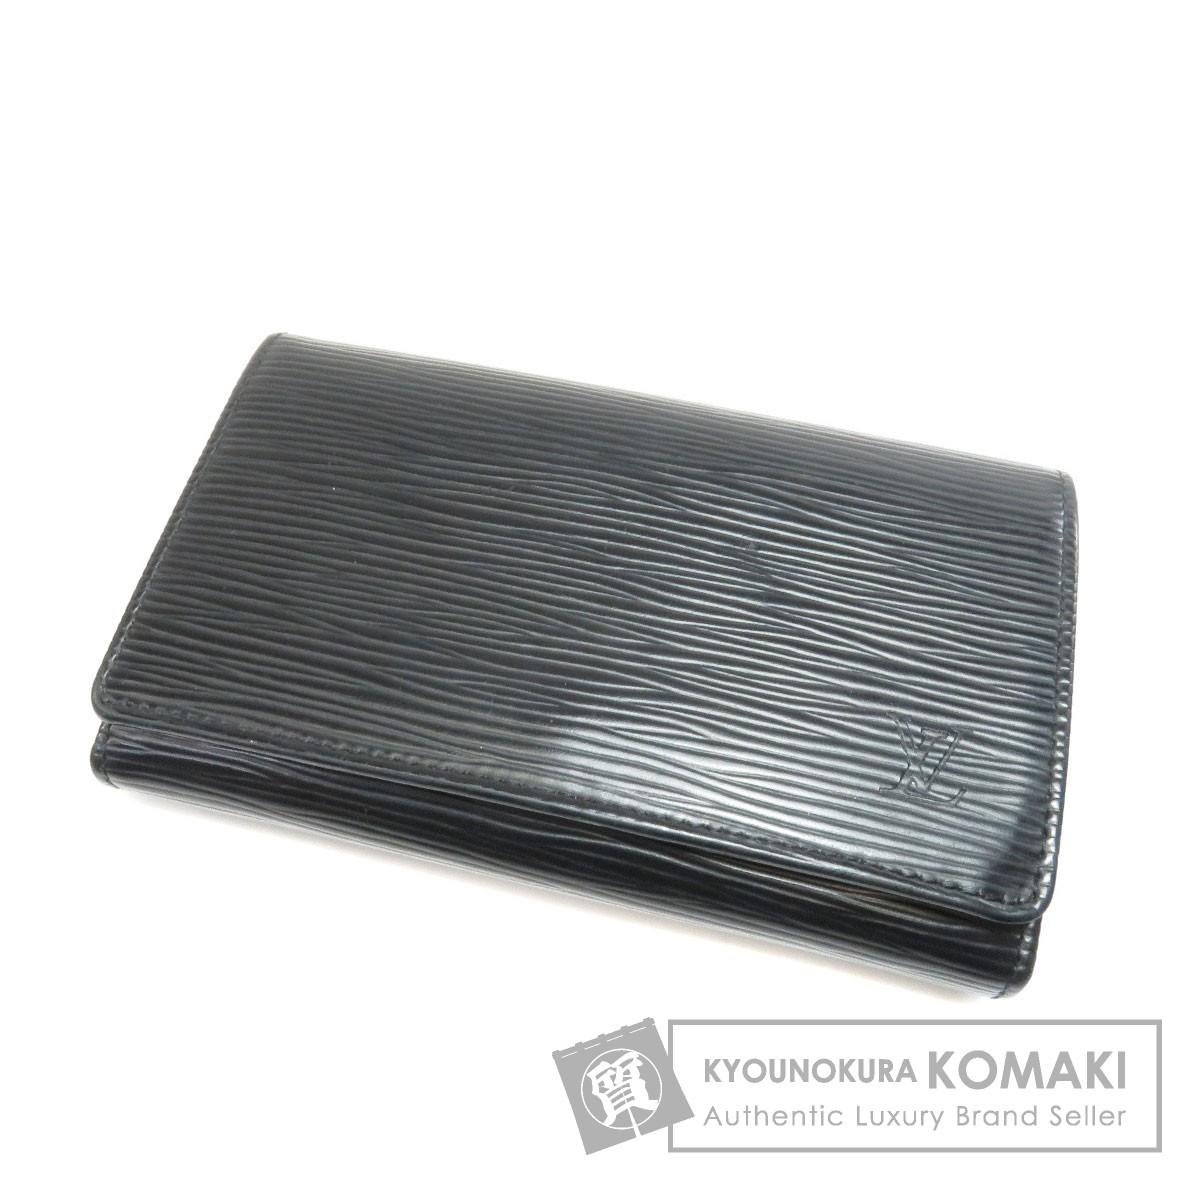 LOUIS VUITTON M63972 ポルトフォイユ・トレゾール 二つ折り財布(小銭入れあり) エピレザー レディース 【中古】【ルイ・ヴィトン】